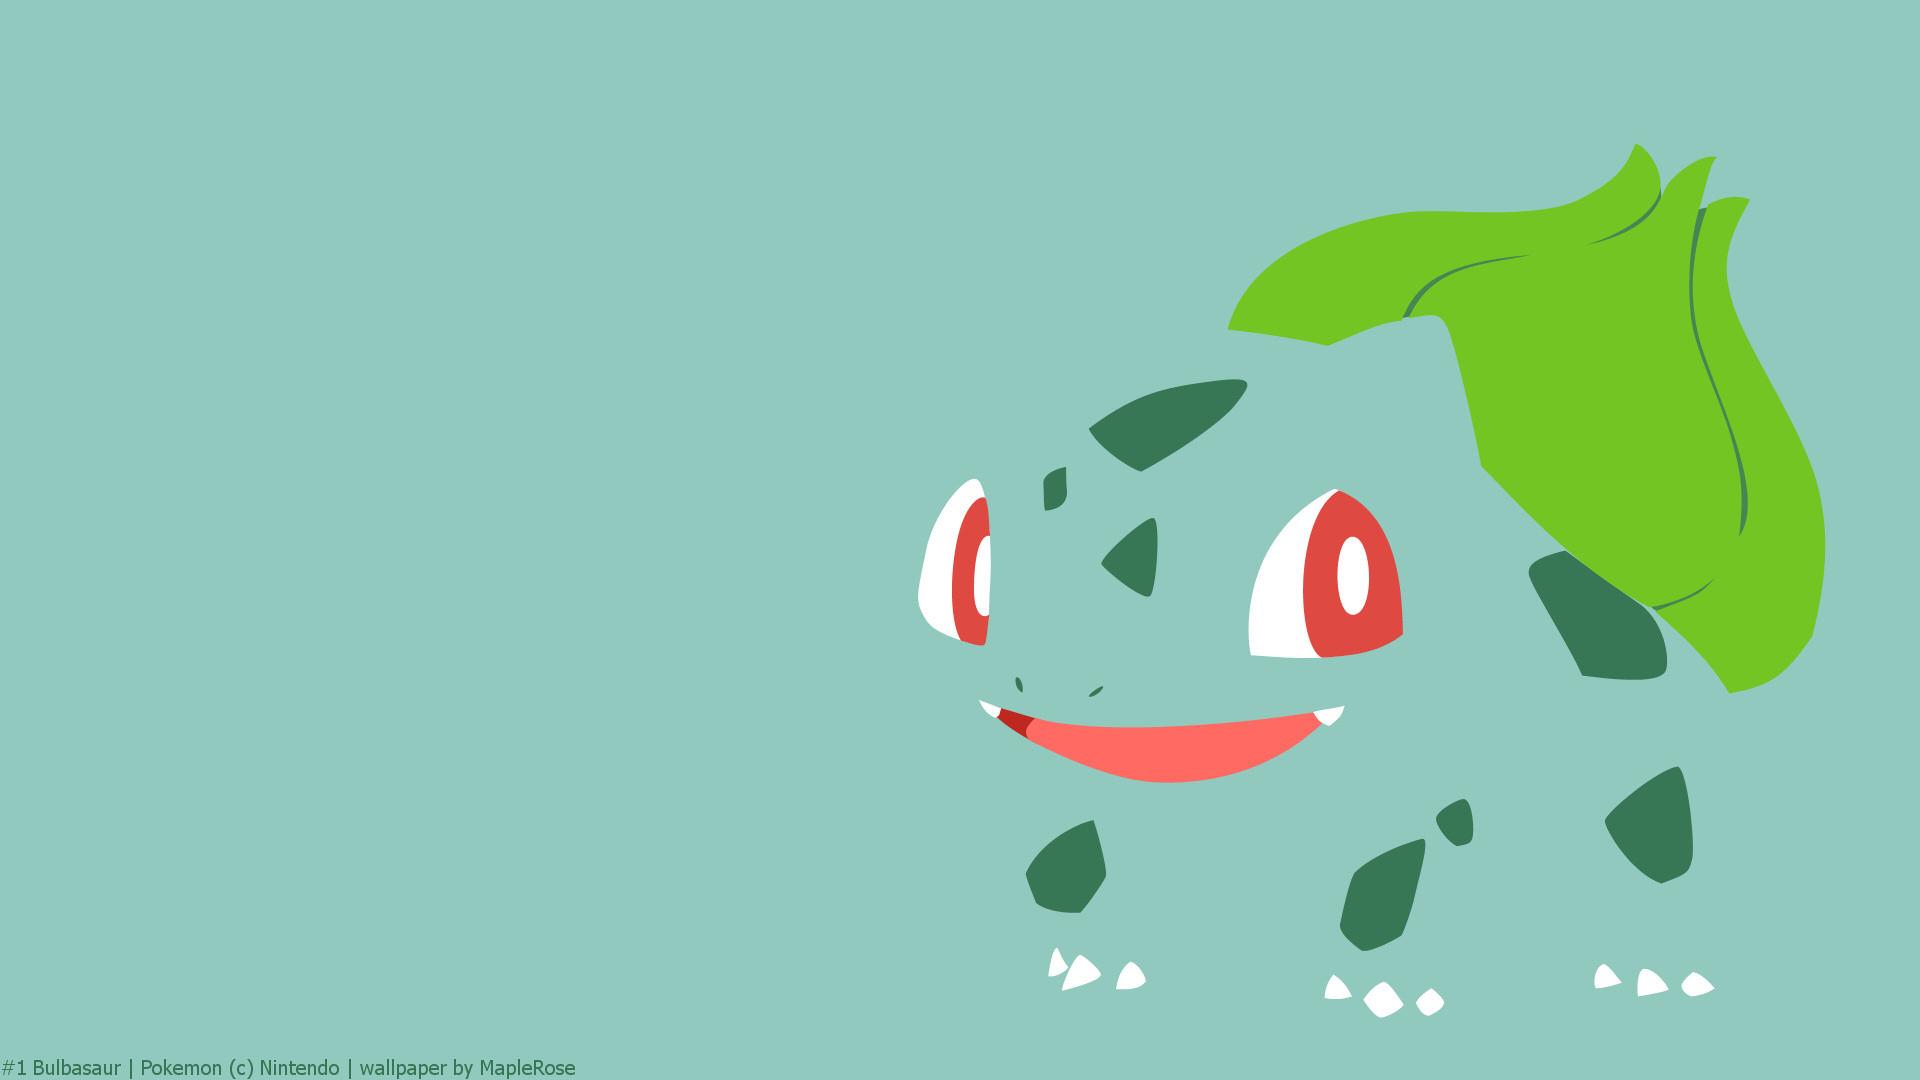 700 Minimalist Pokemon Wallpapers [1920×1080] Need #iPhone #6S #Plus # Wallpaper